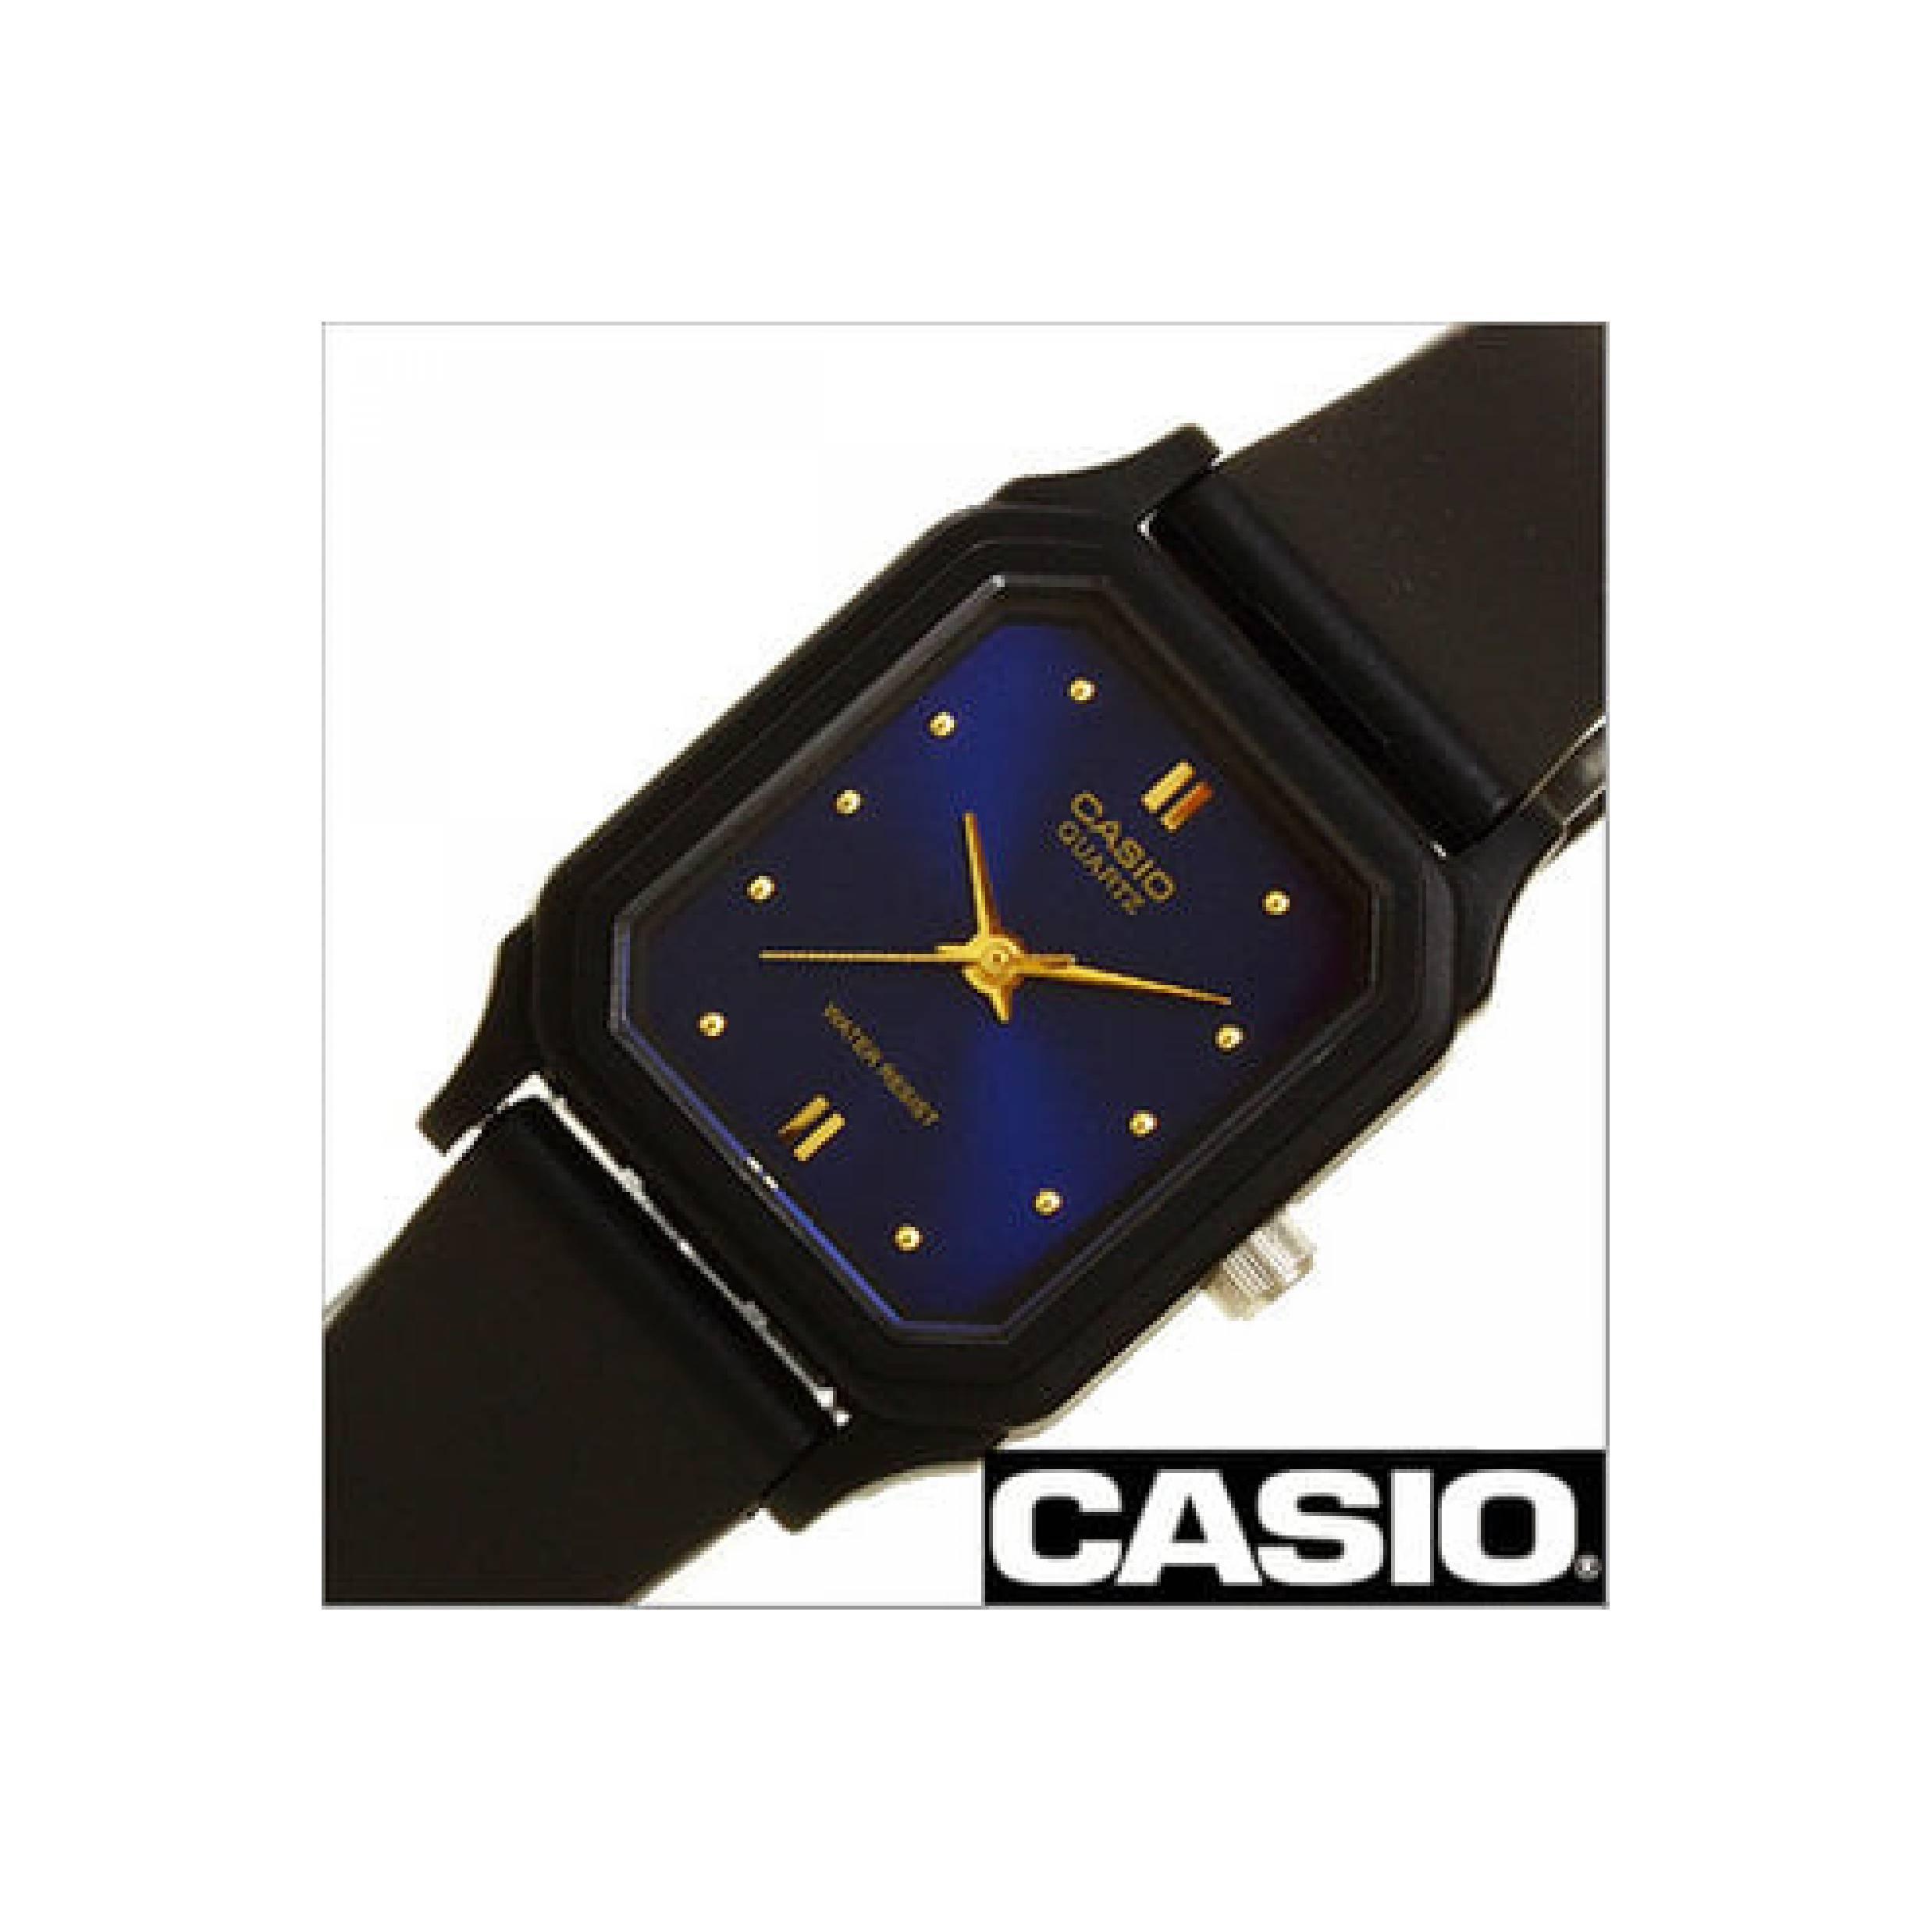 Casio Analog Jam Tangan Pria Hitam Strap Karet Mq 24 1b2 Update Casio Europe Mq 1bllgf